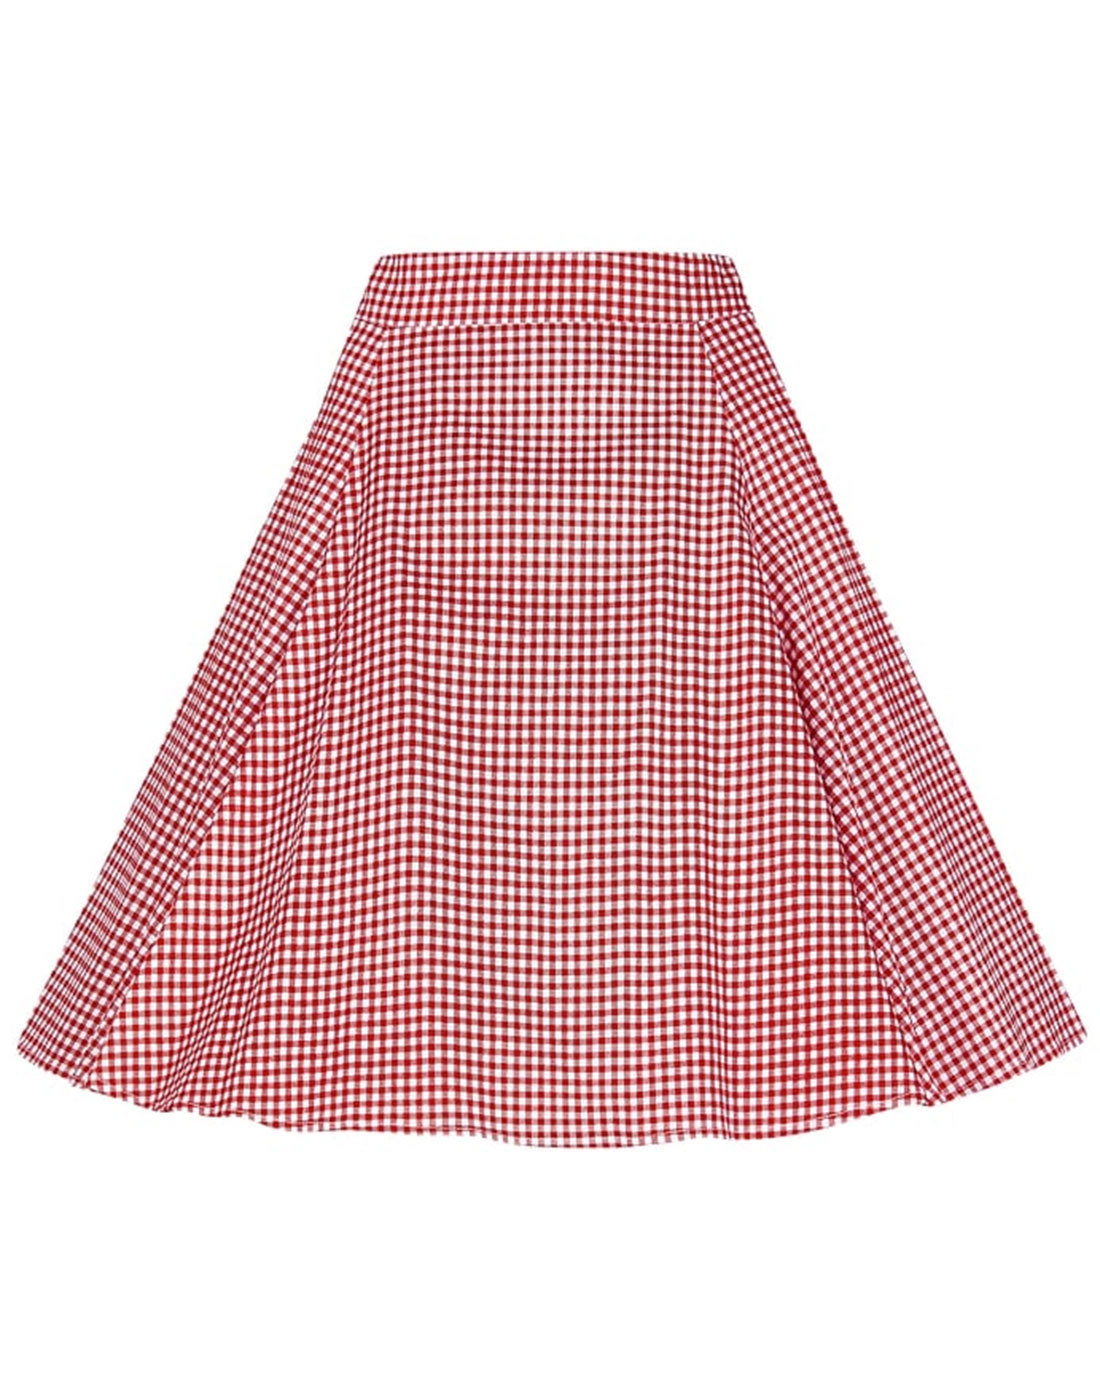 Tammy COLLECTIF Retro 50s Gingham Circle Skirt